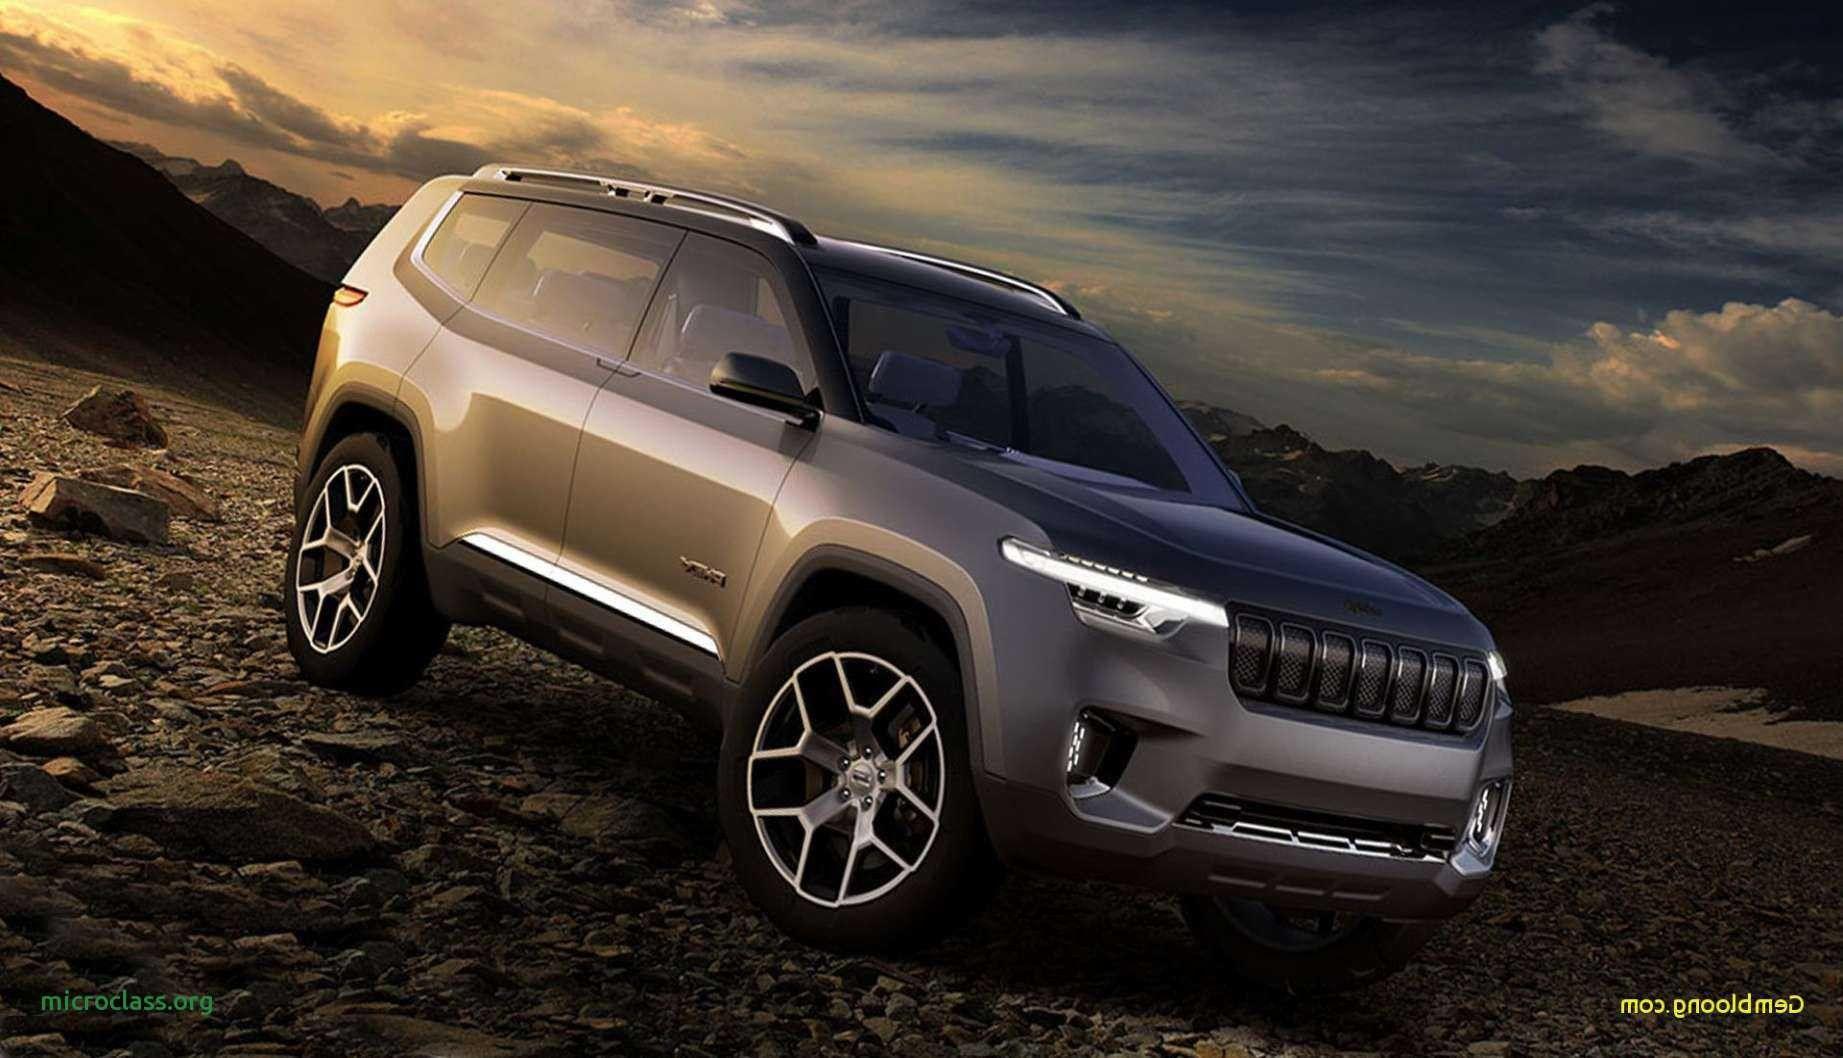 2019 Jeep Grand Cherokee Srt The Best Car Club Luxury Jeep Jeep Grand Cherokee Jeep Grand Jeep Wagoneer